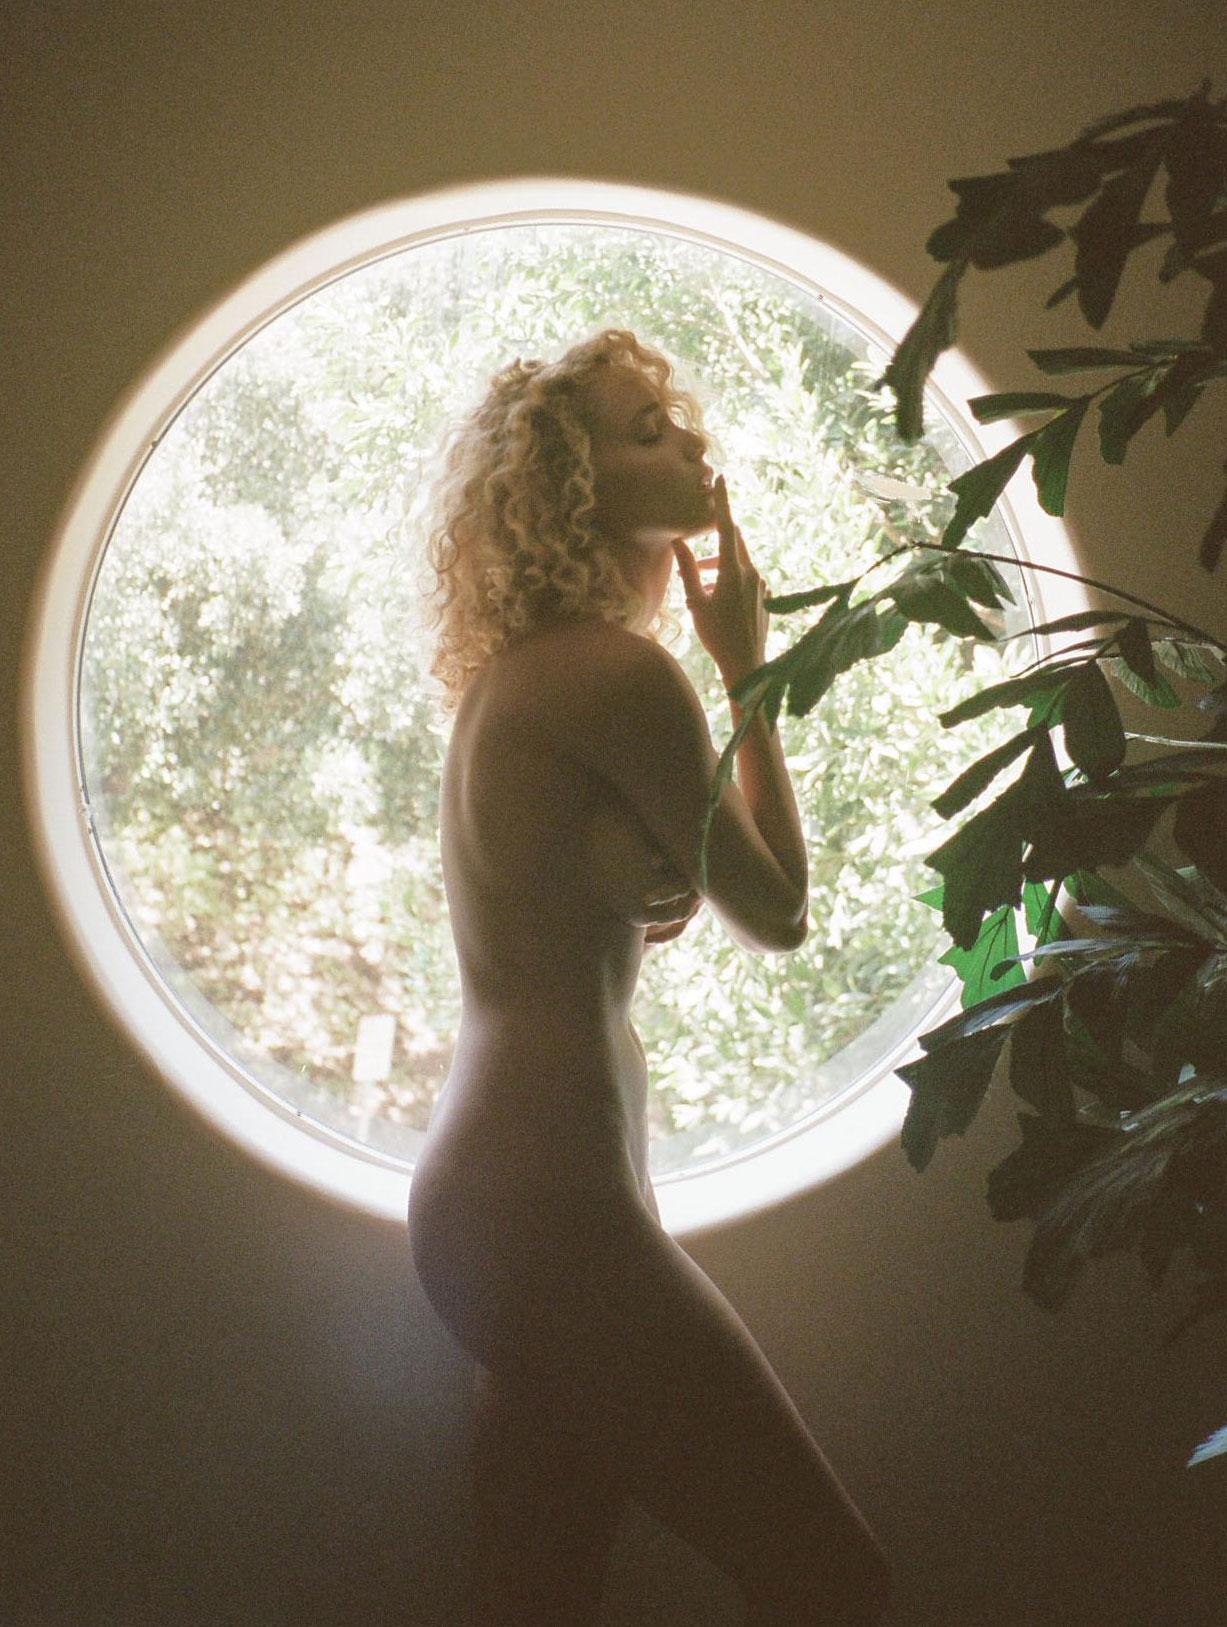 Девушка месяца Алли Сильва / Allie Silva - Playboy october 2016 playmate